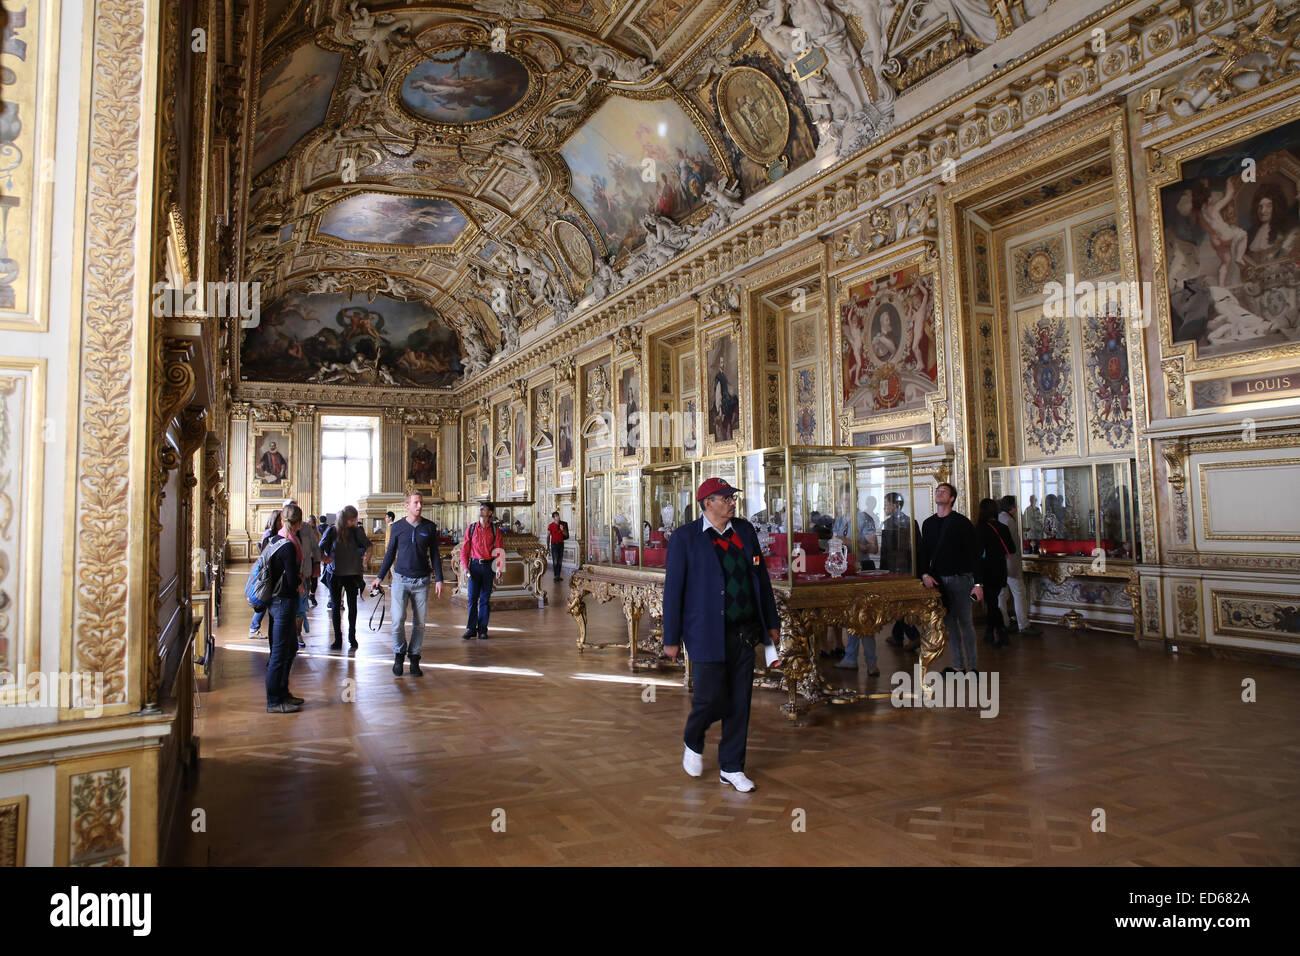 Louvre Galerie d'Apollon - Stock Image